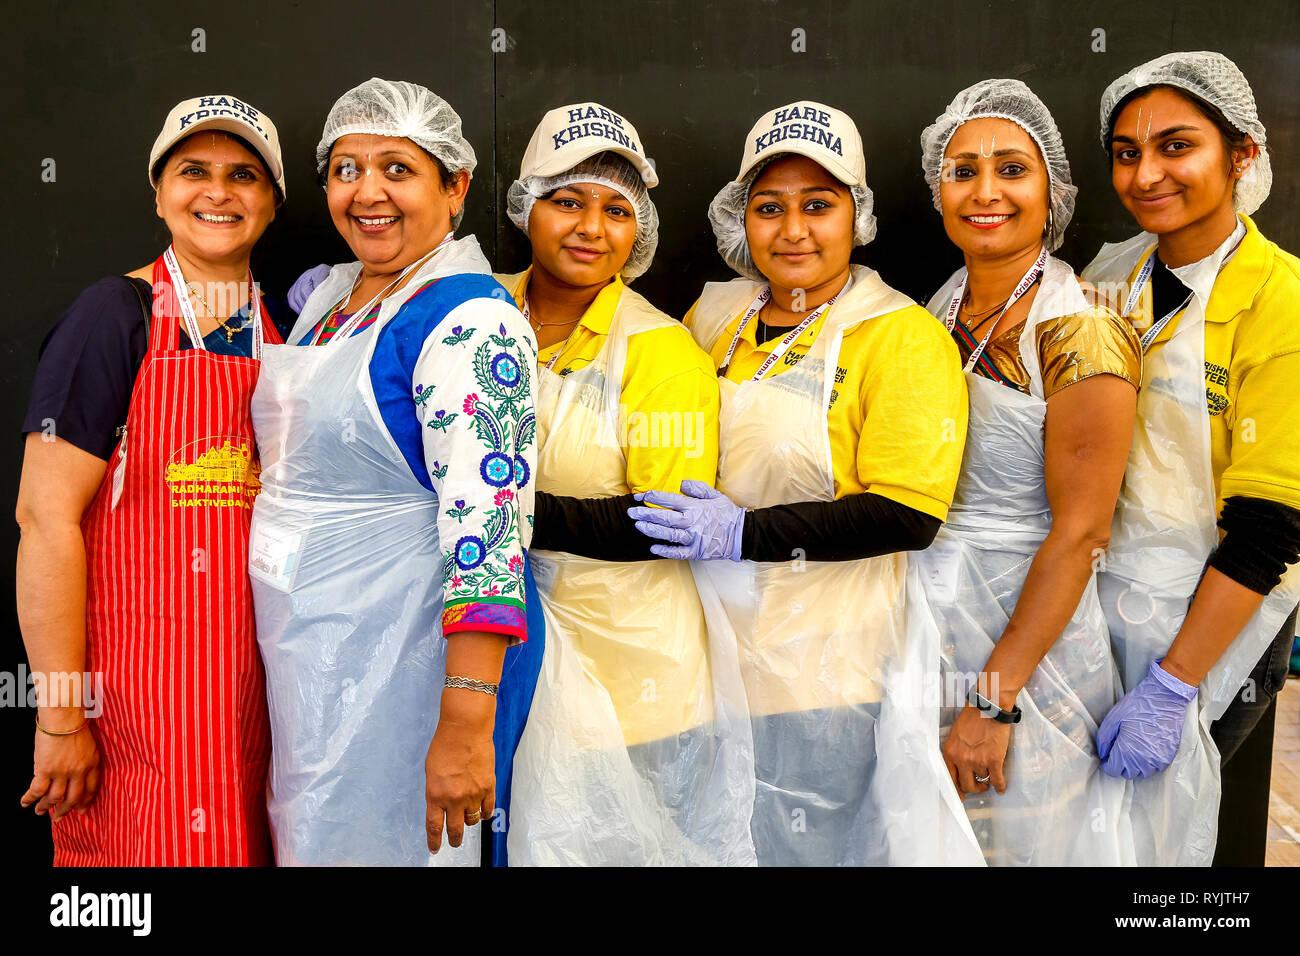 Volunteers at Janmashtami hindu festival, Watford, U.K. - Stock Image